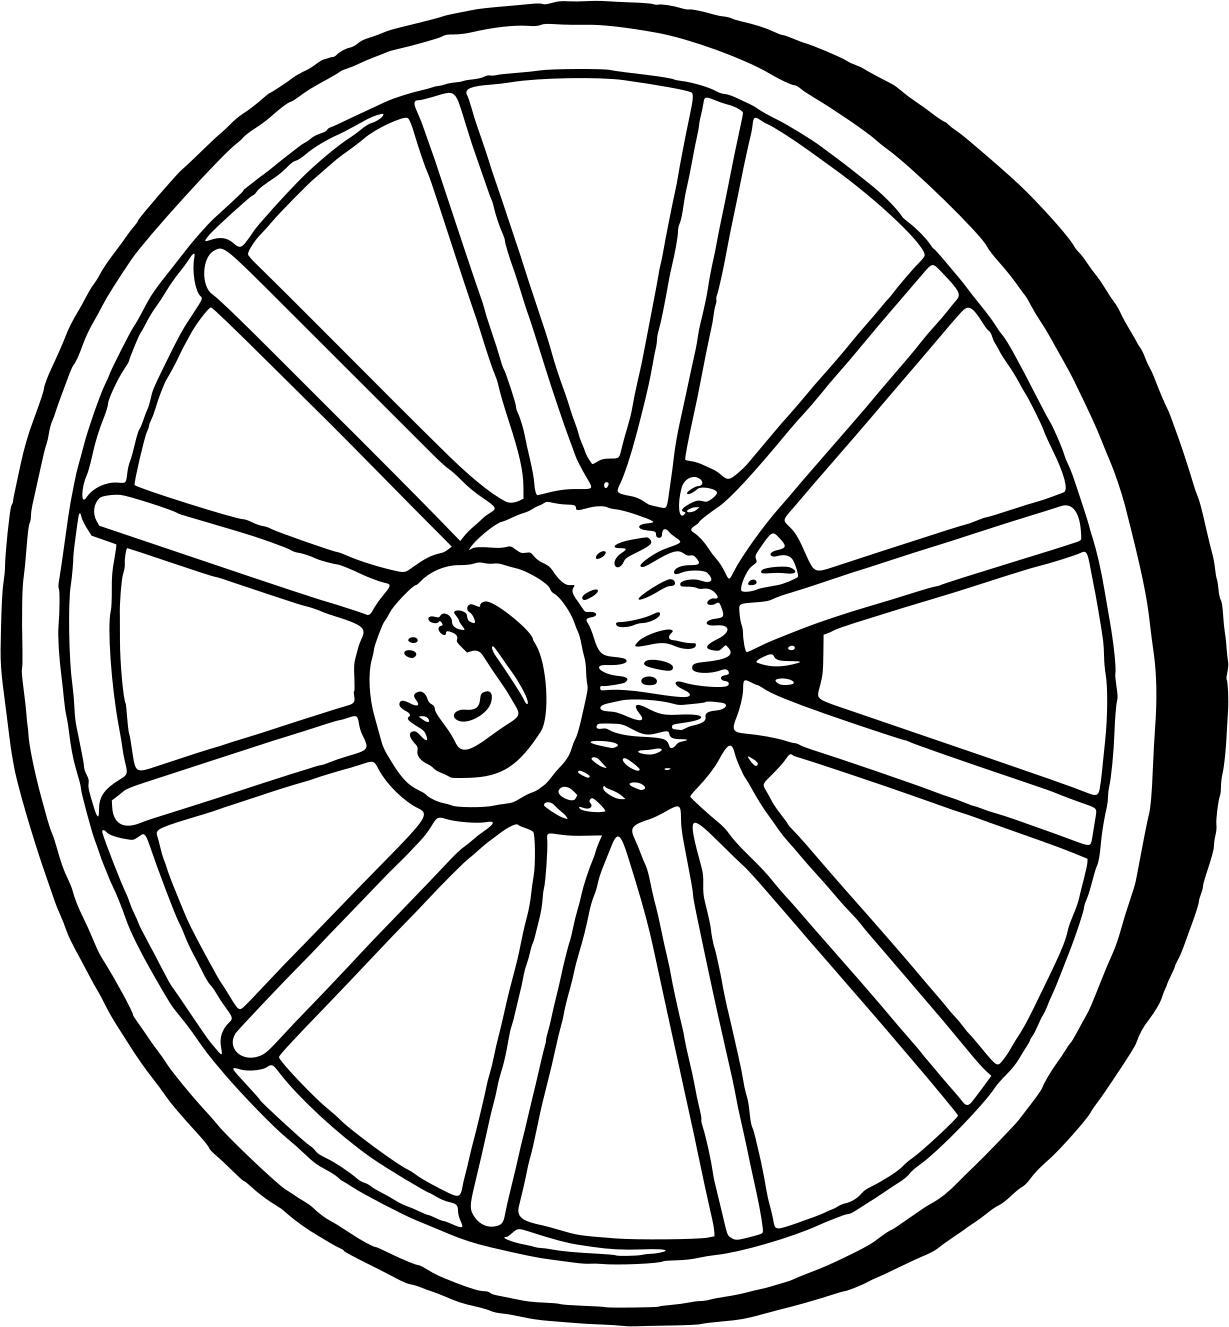 1229x1327 Wagonwheel 2 Clipart